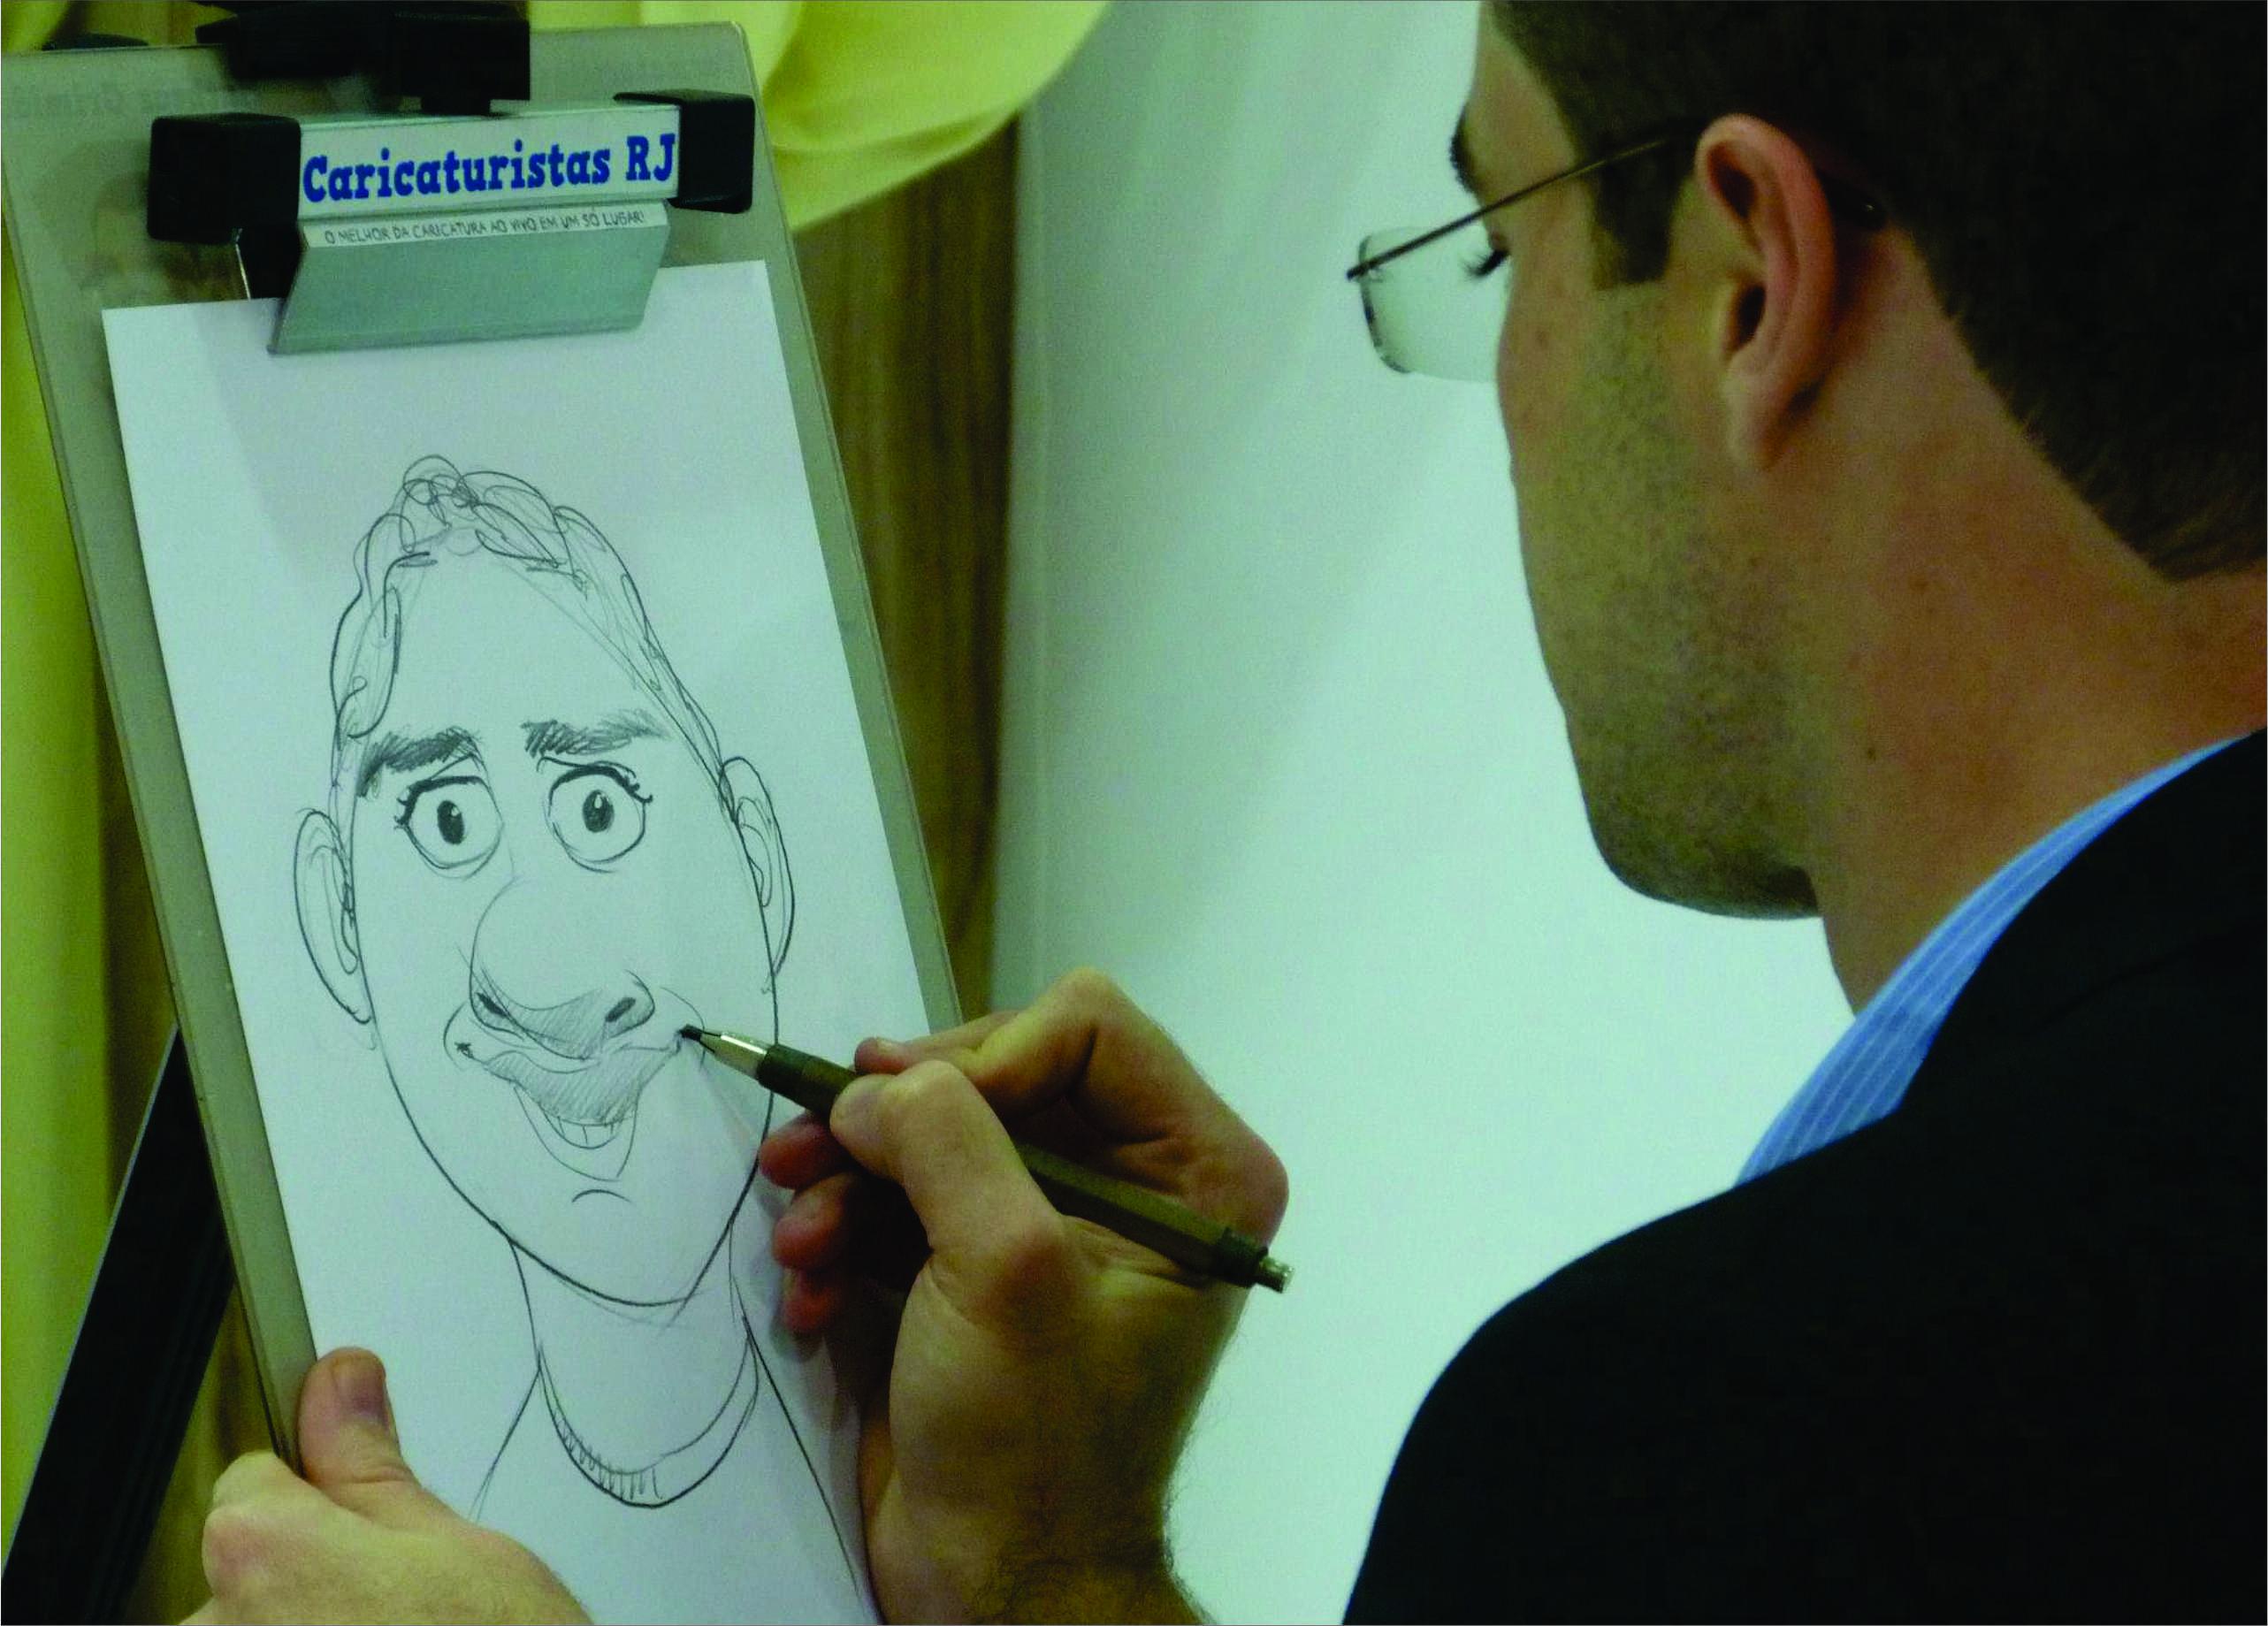 caricaturistas rj eventos